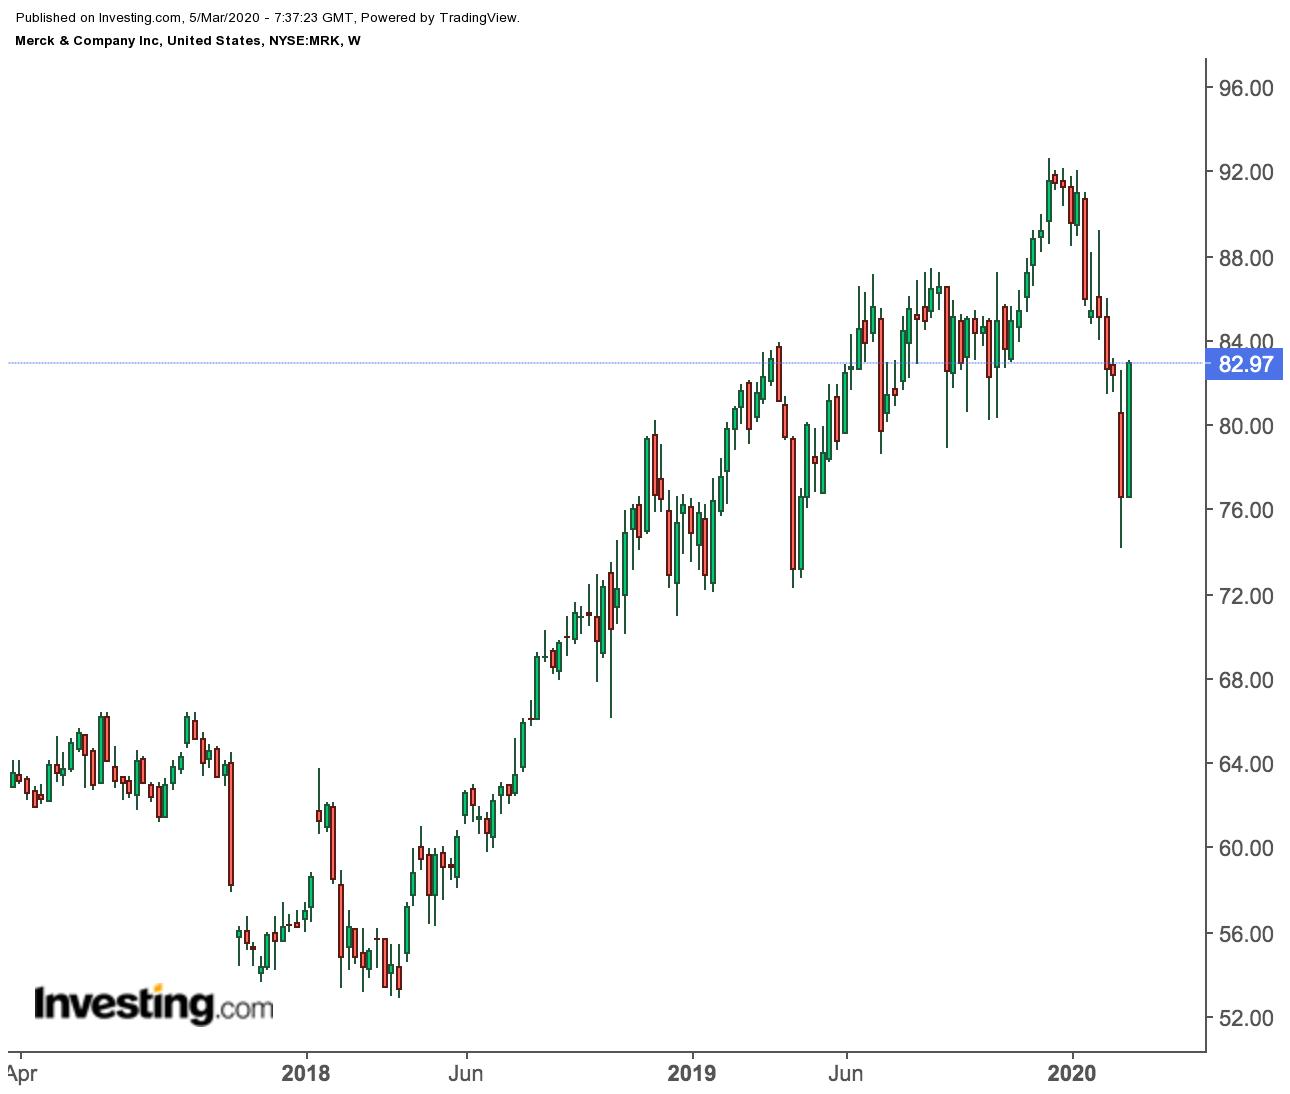 Merck & Co. Weekly Price Chart